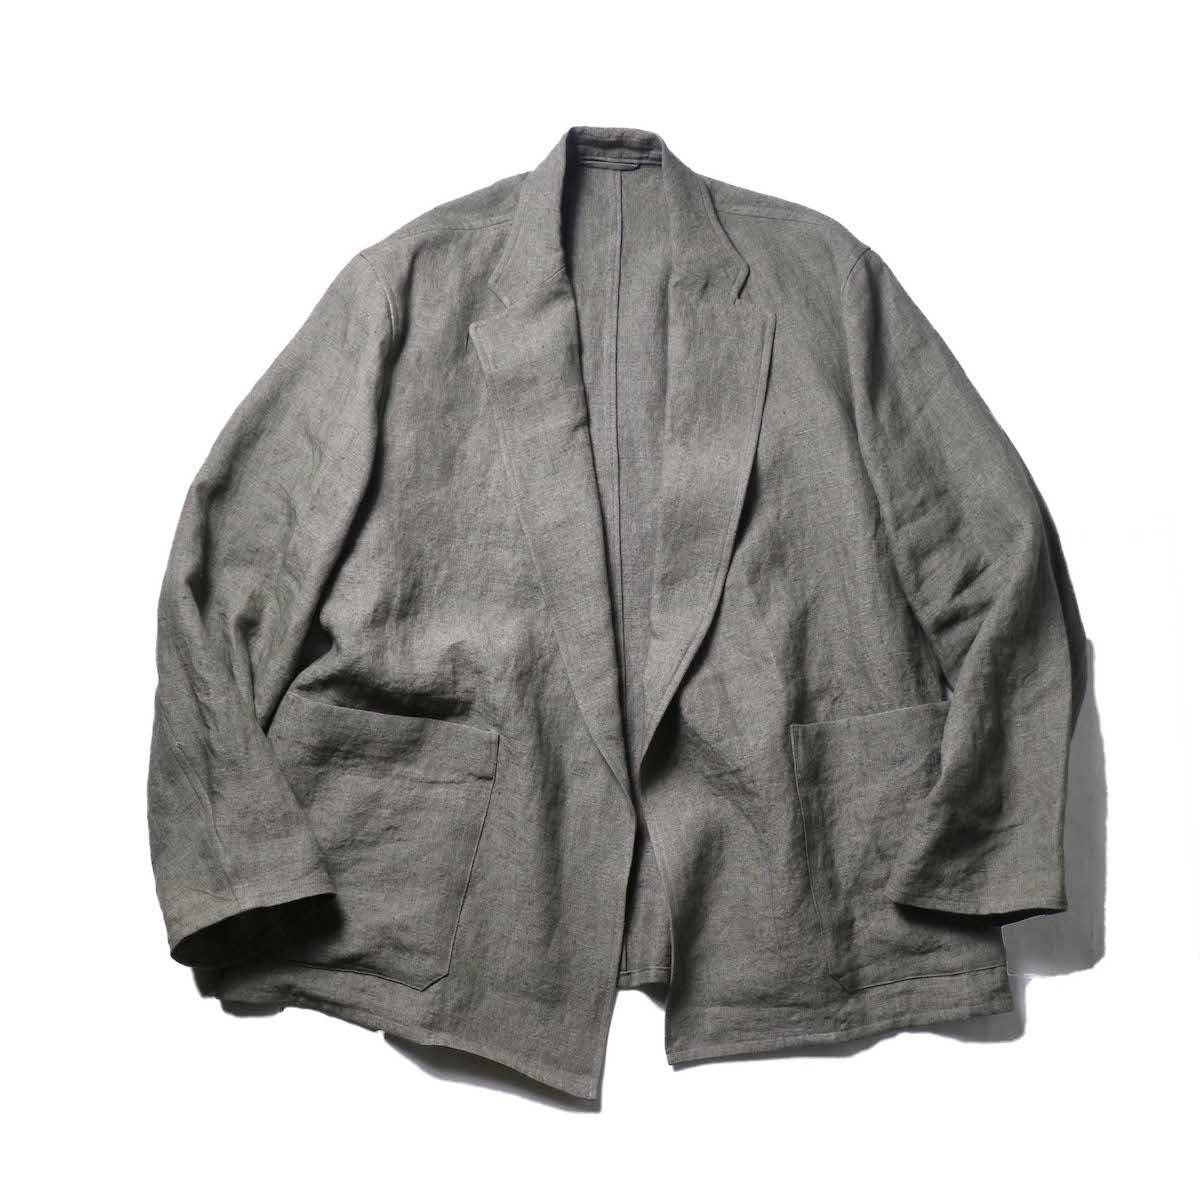 blurhms / Wash Linen Cardigan Jacket (KhakiGrey)